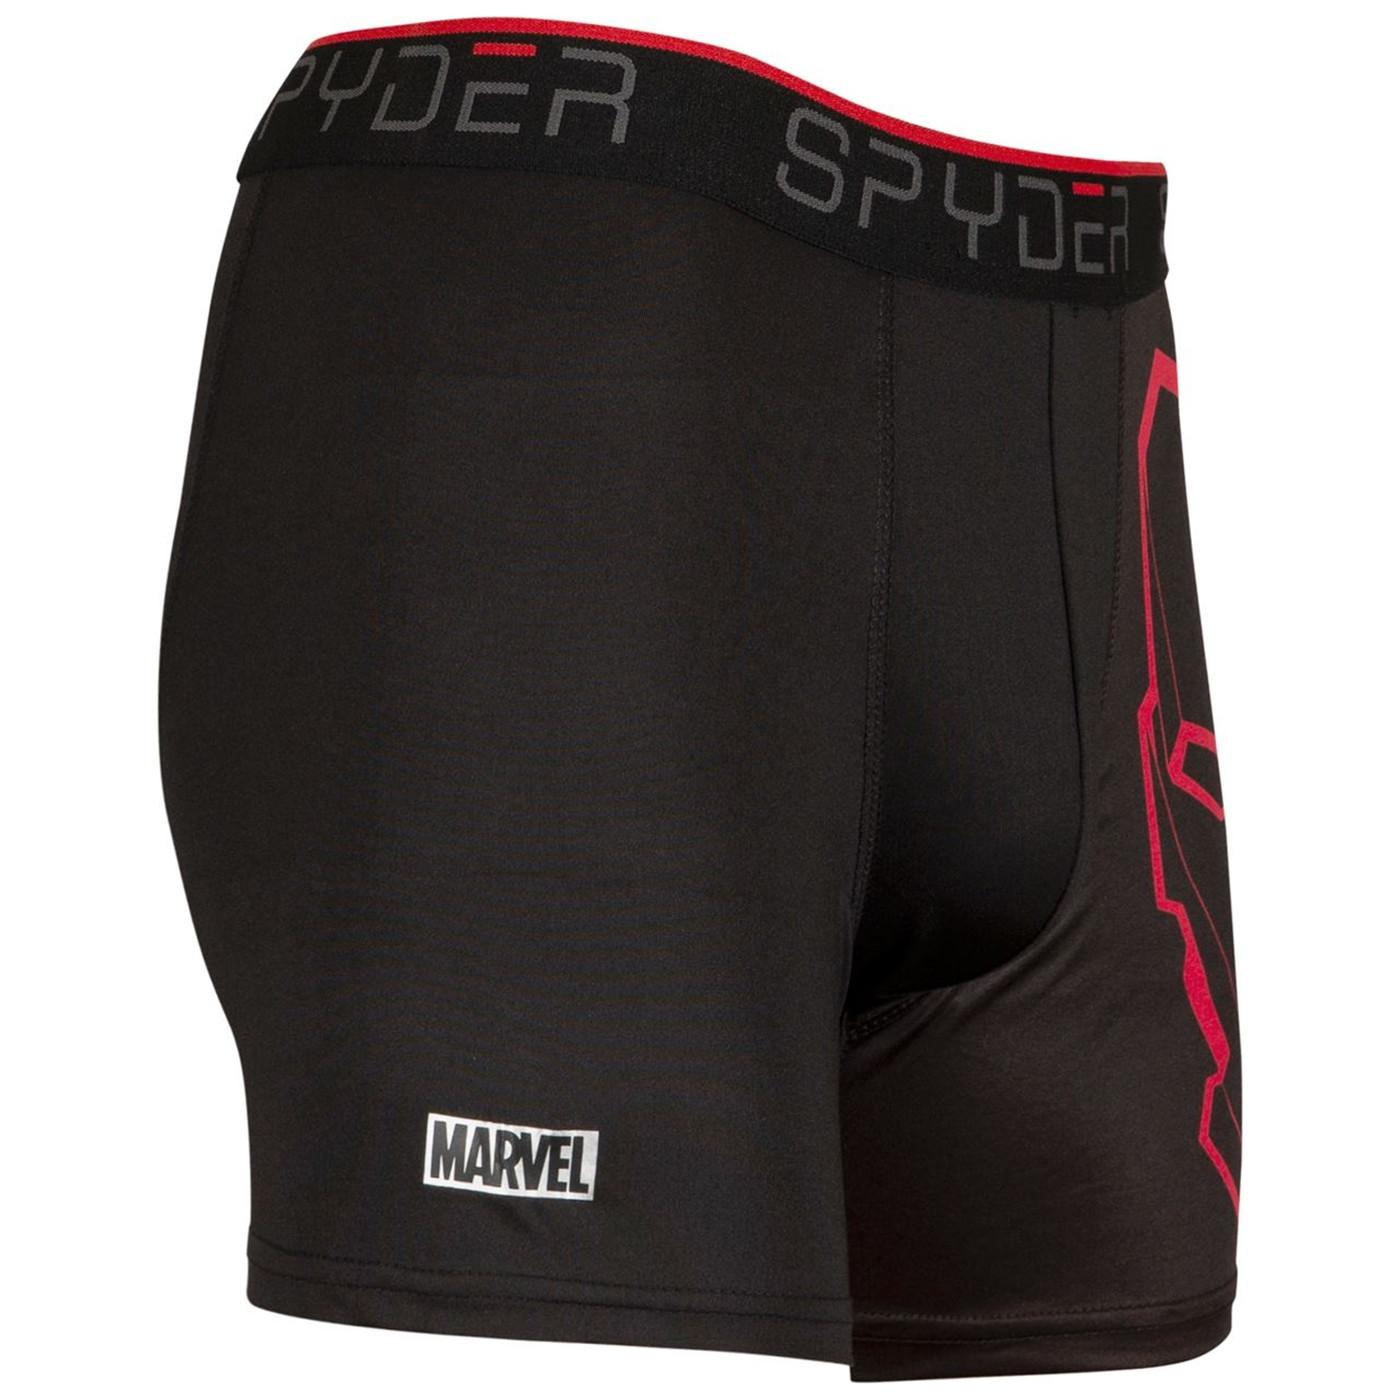 Iron Man Spyder Performance Sports Boxer Briefs 3-Pair Pack